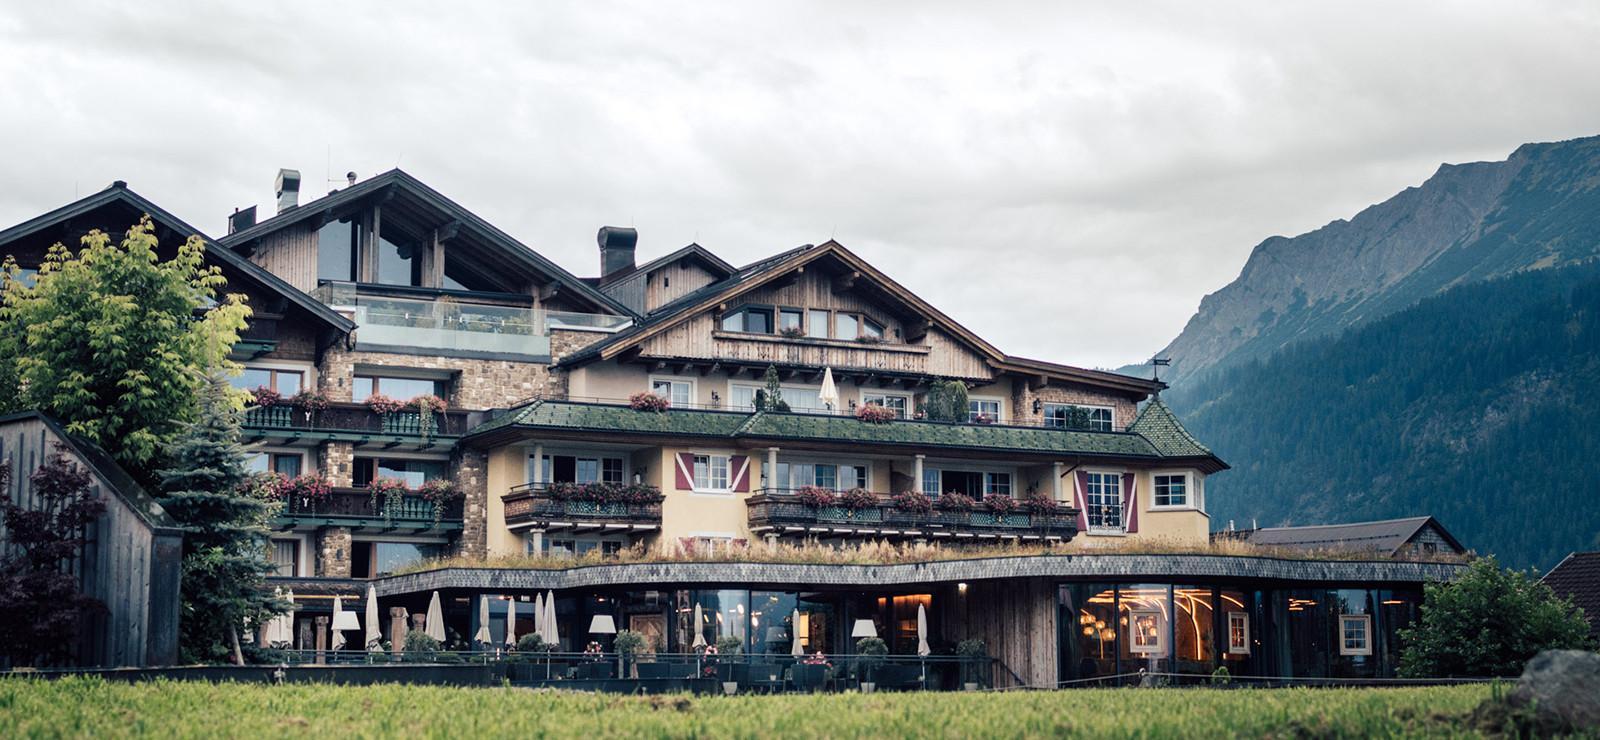 Wellness Hotel im Tannheimer Tal - Der Engel Bilder | Bild 1